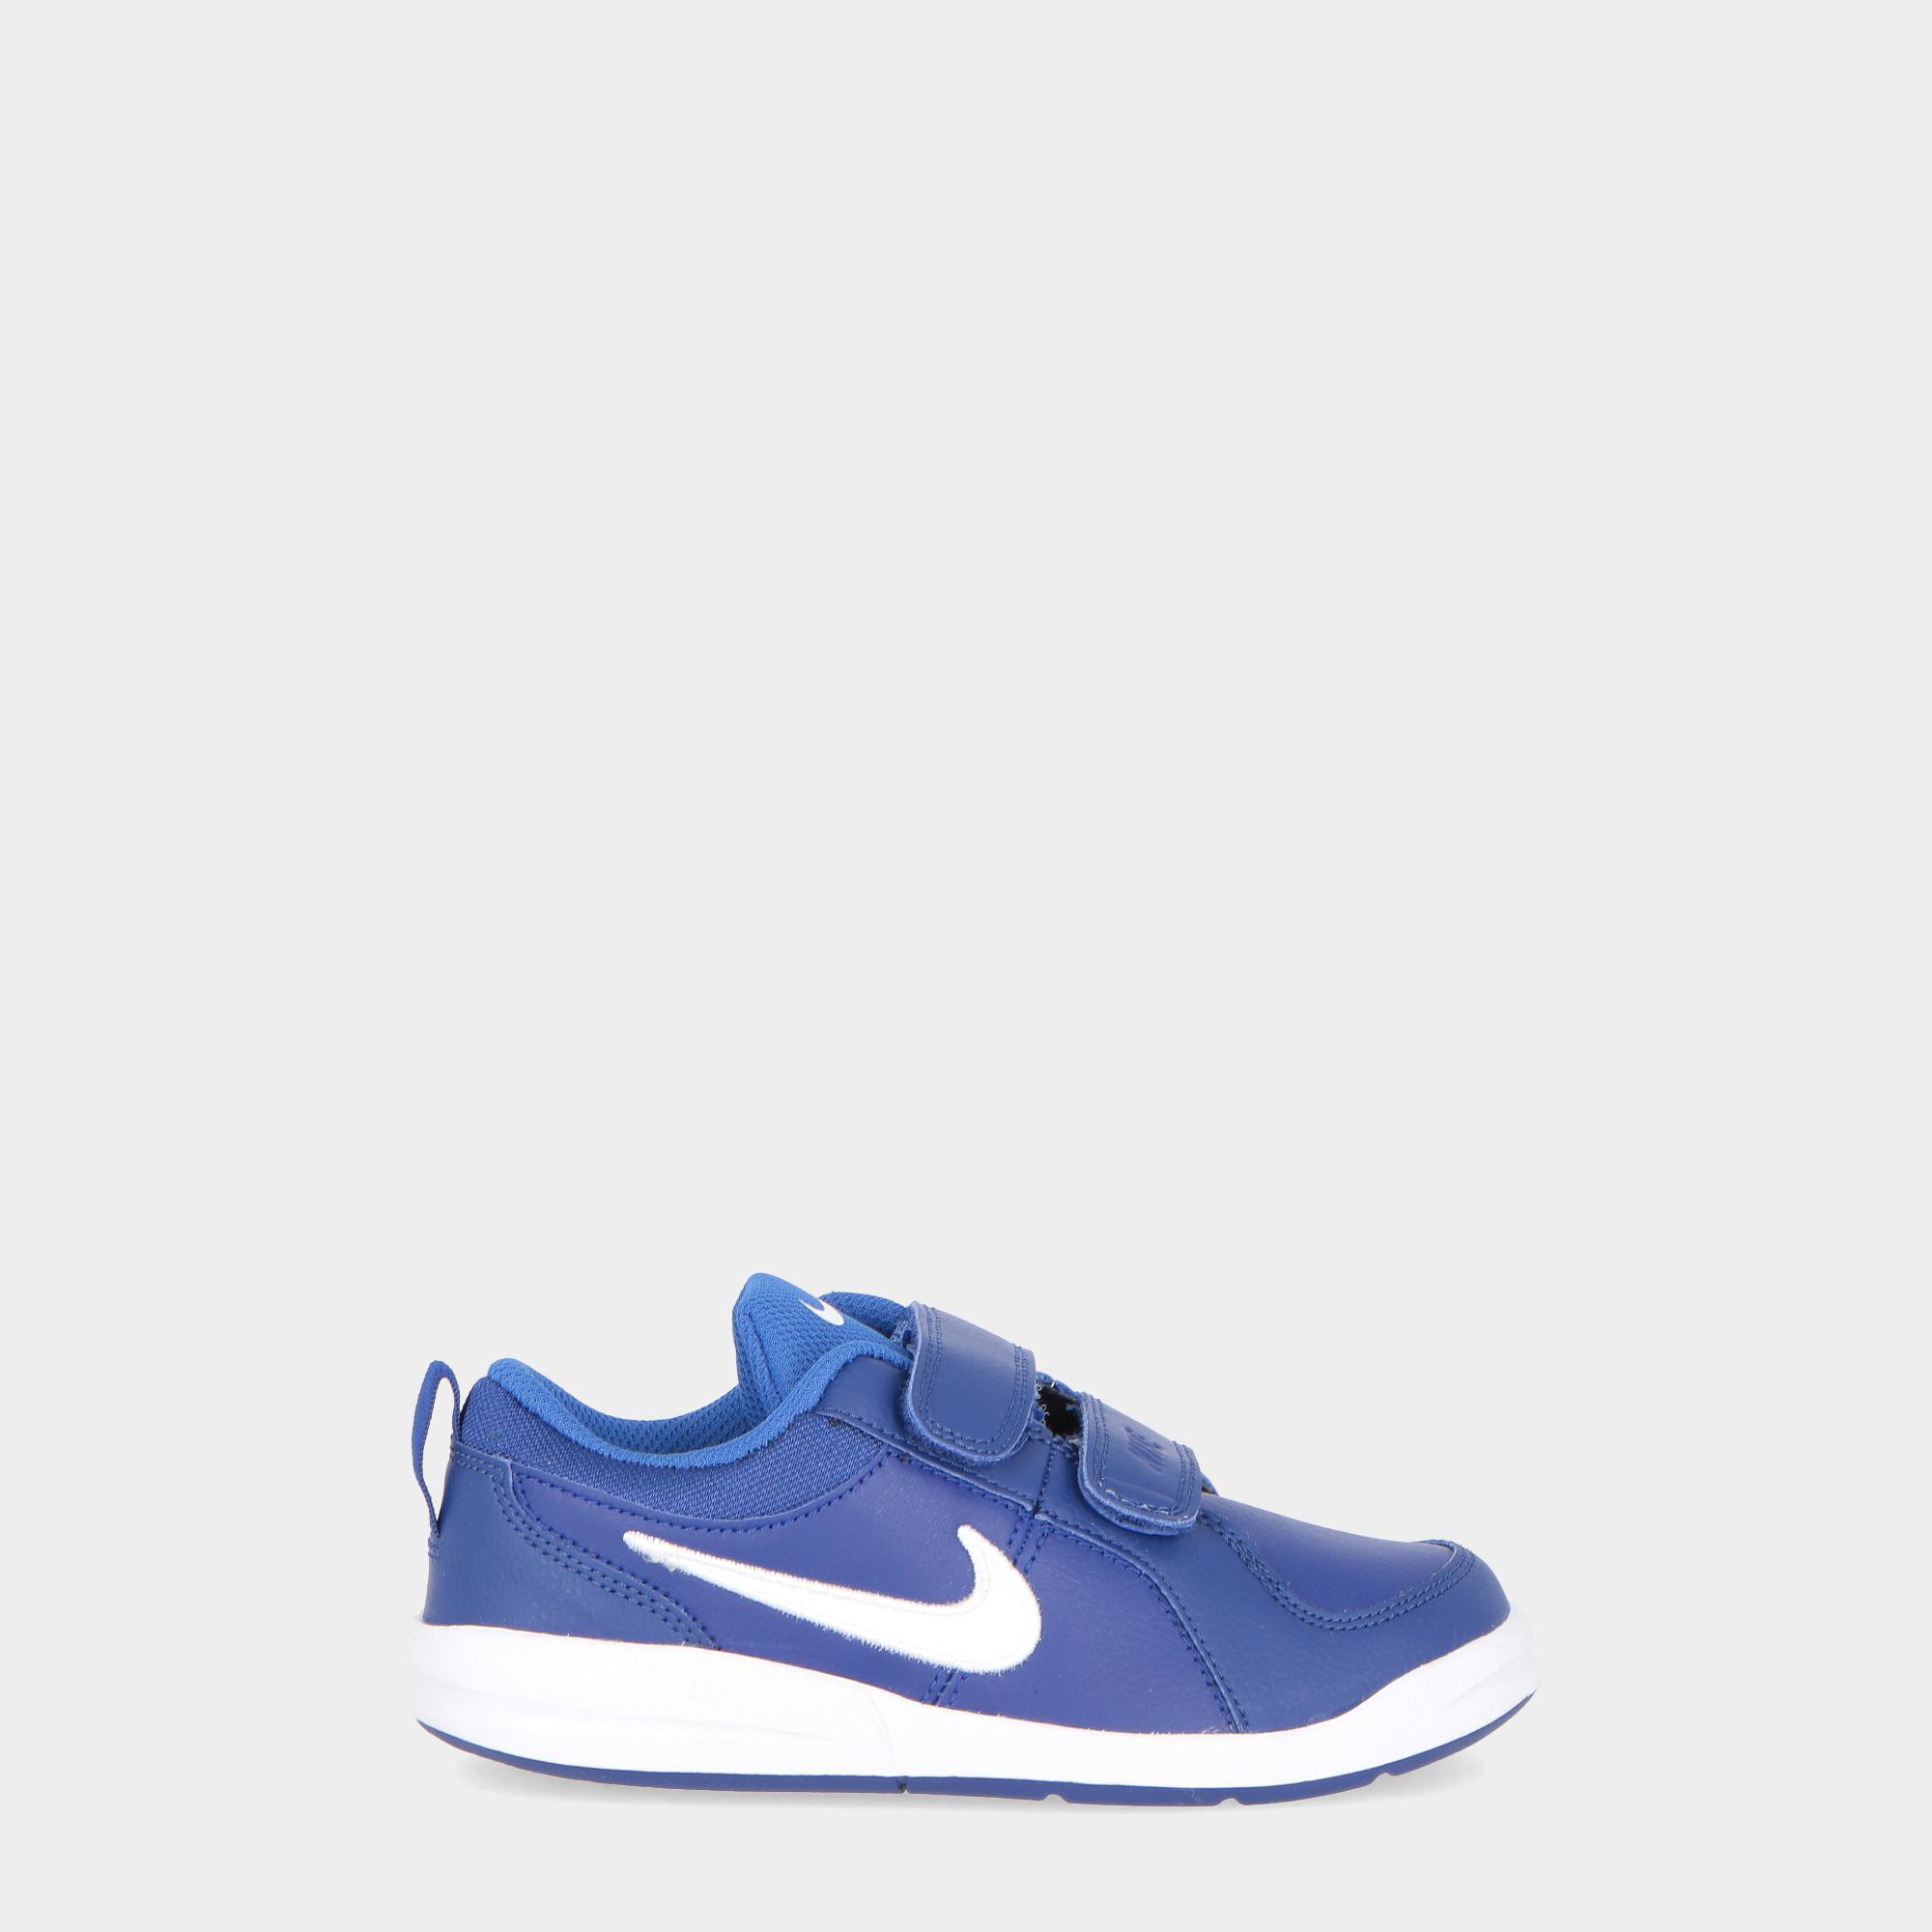 Nike Pico 4 Psv Royal White  58e39818554